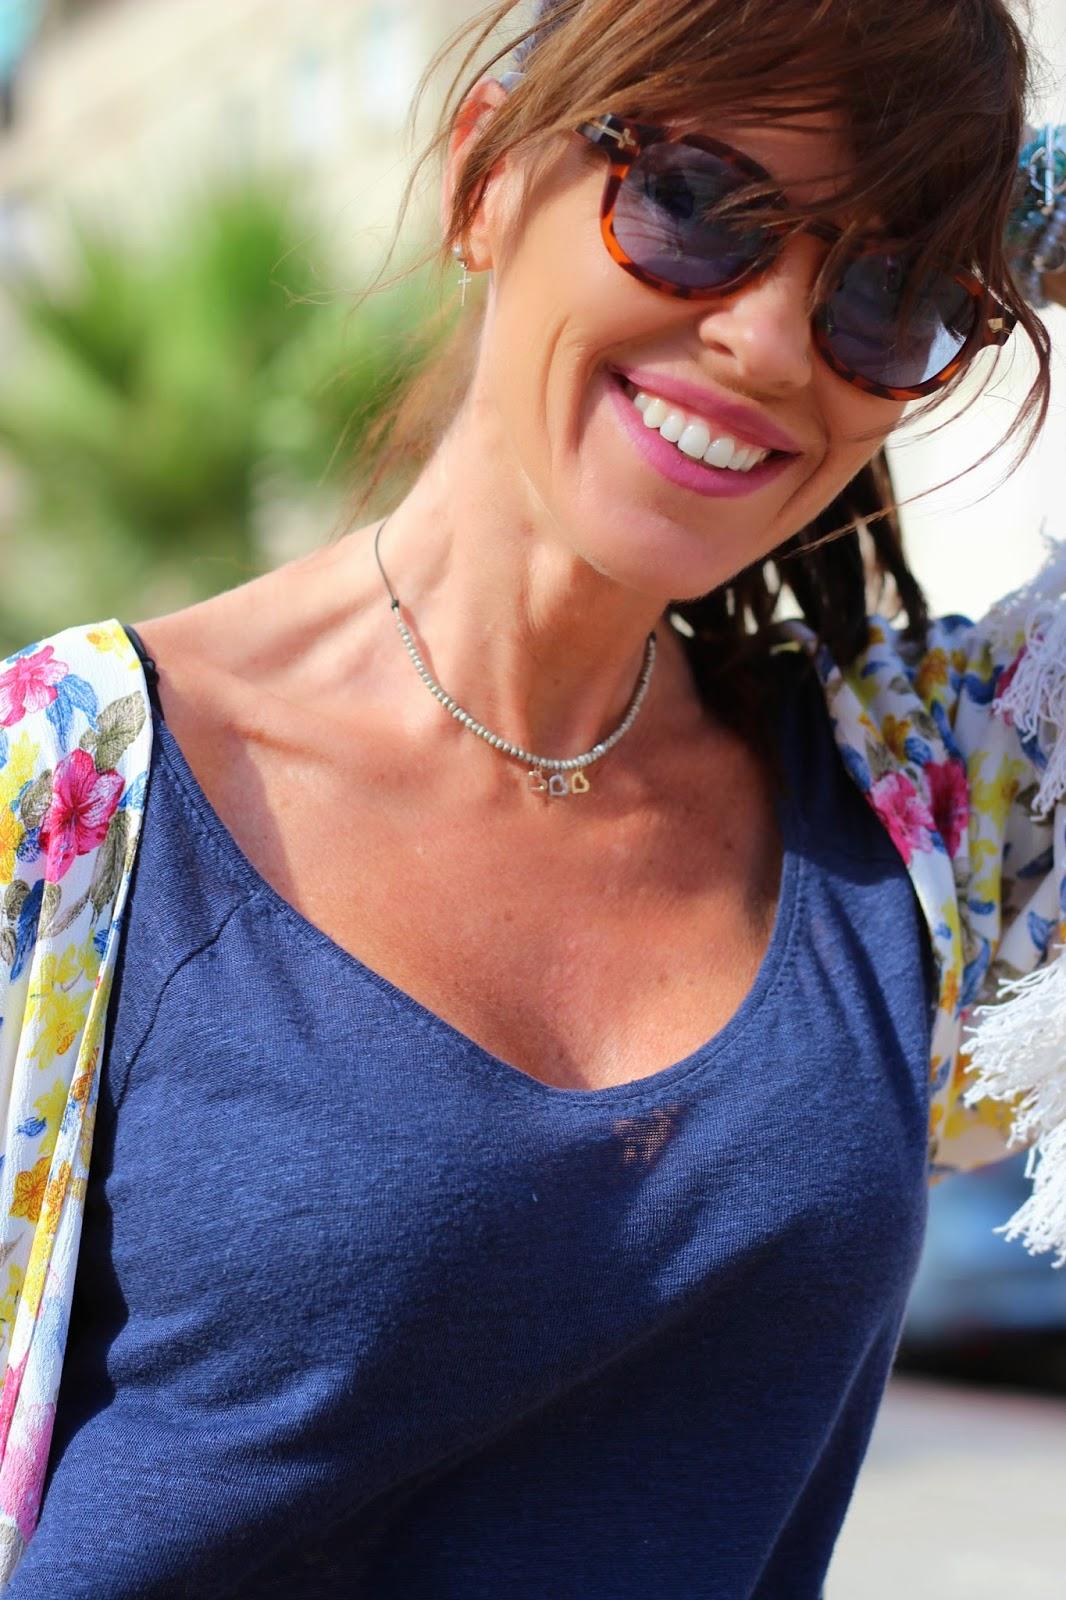 Opposit sunnies - kimono flecos - kimono flores - collar cuchicuchi